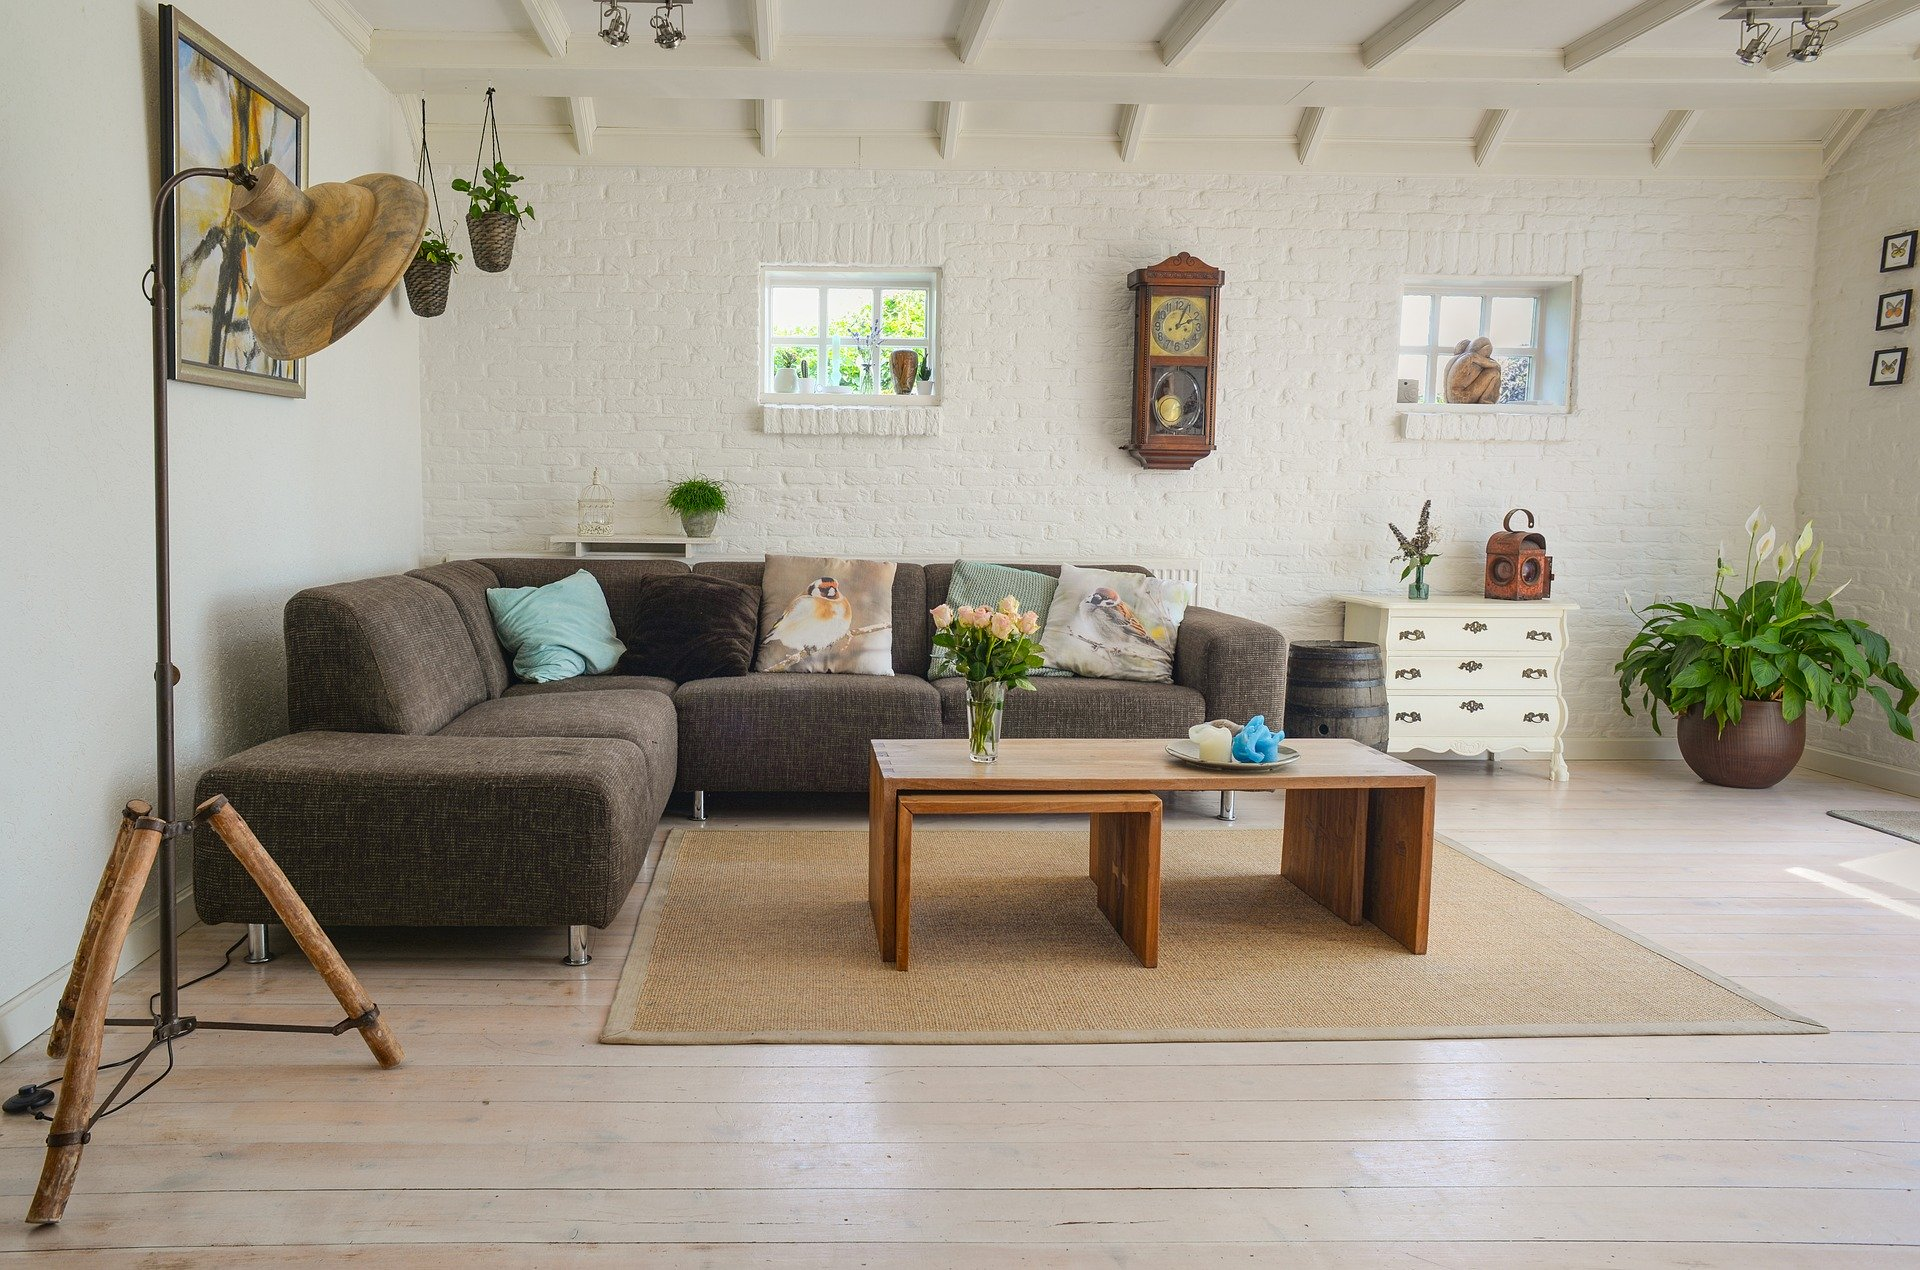 Tre gode råd til, hvordan du indretter stuen for hele familien